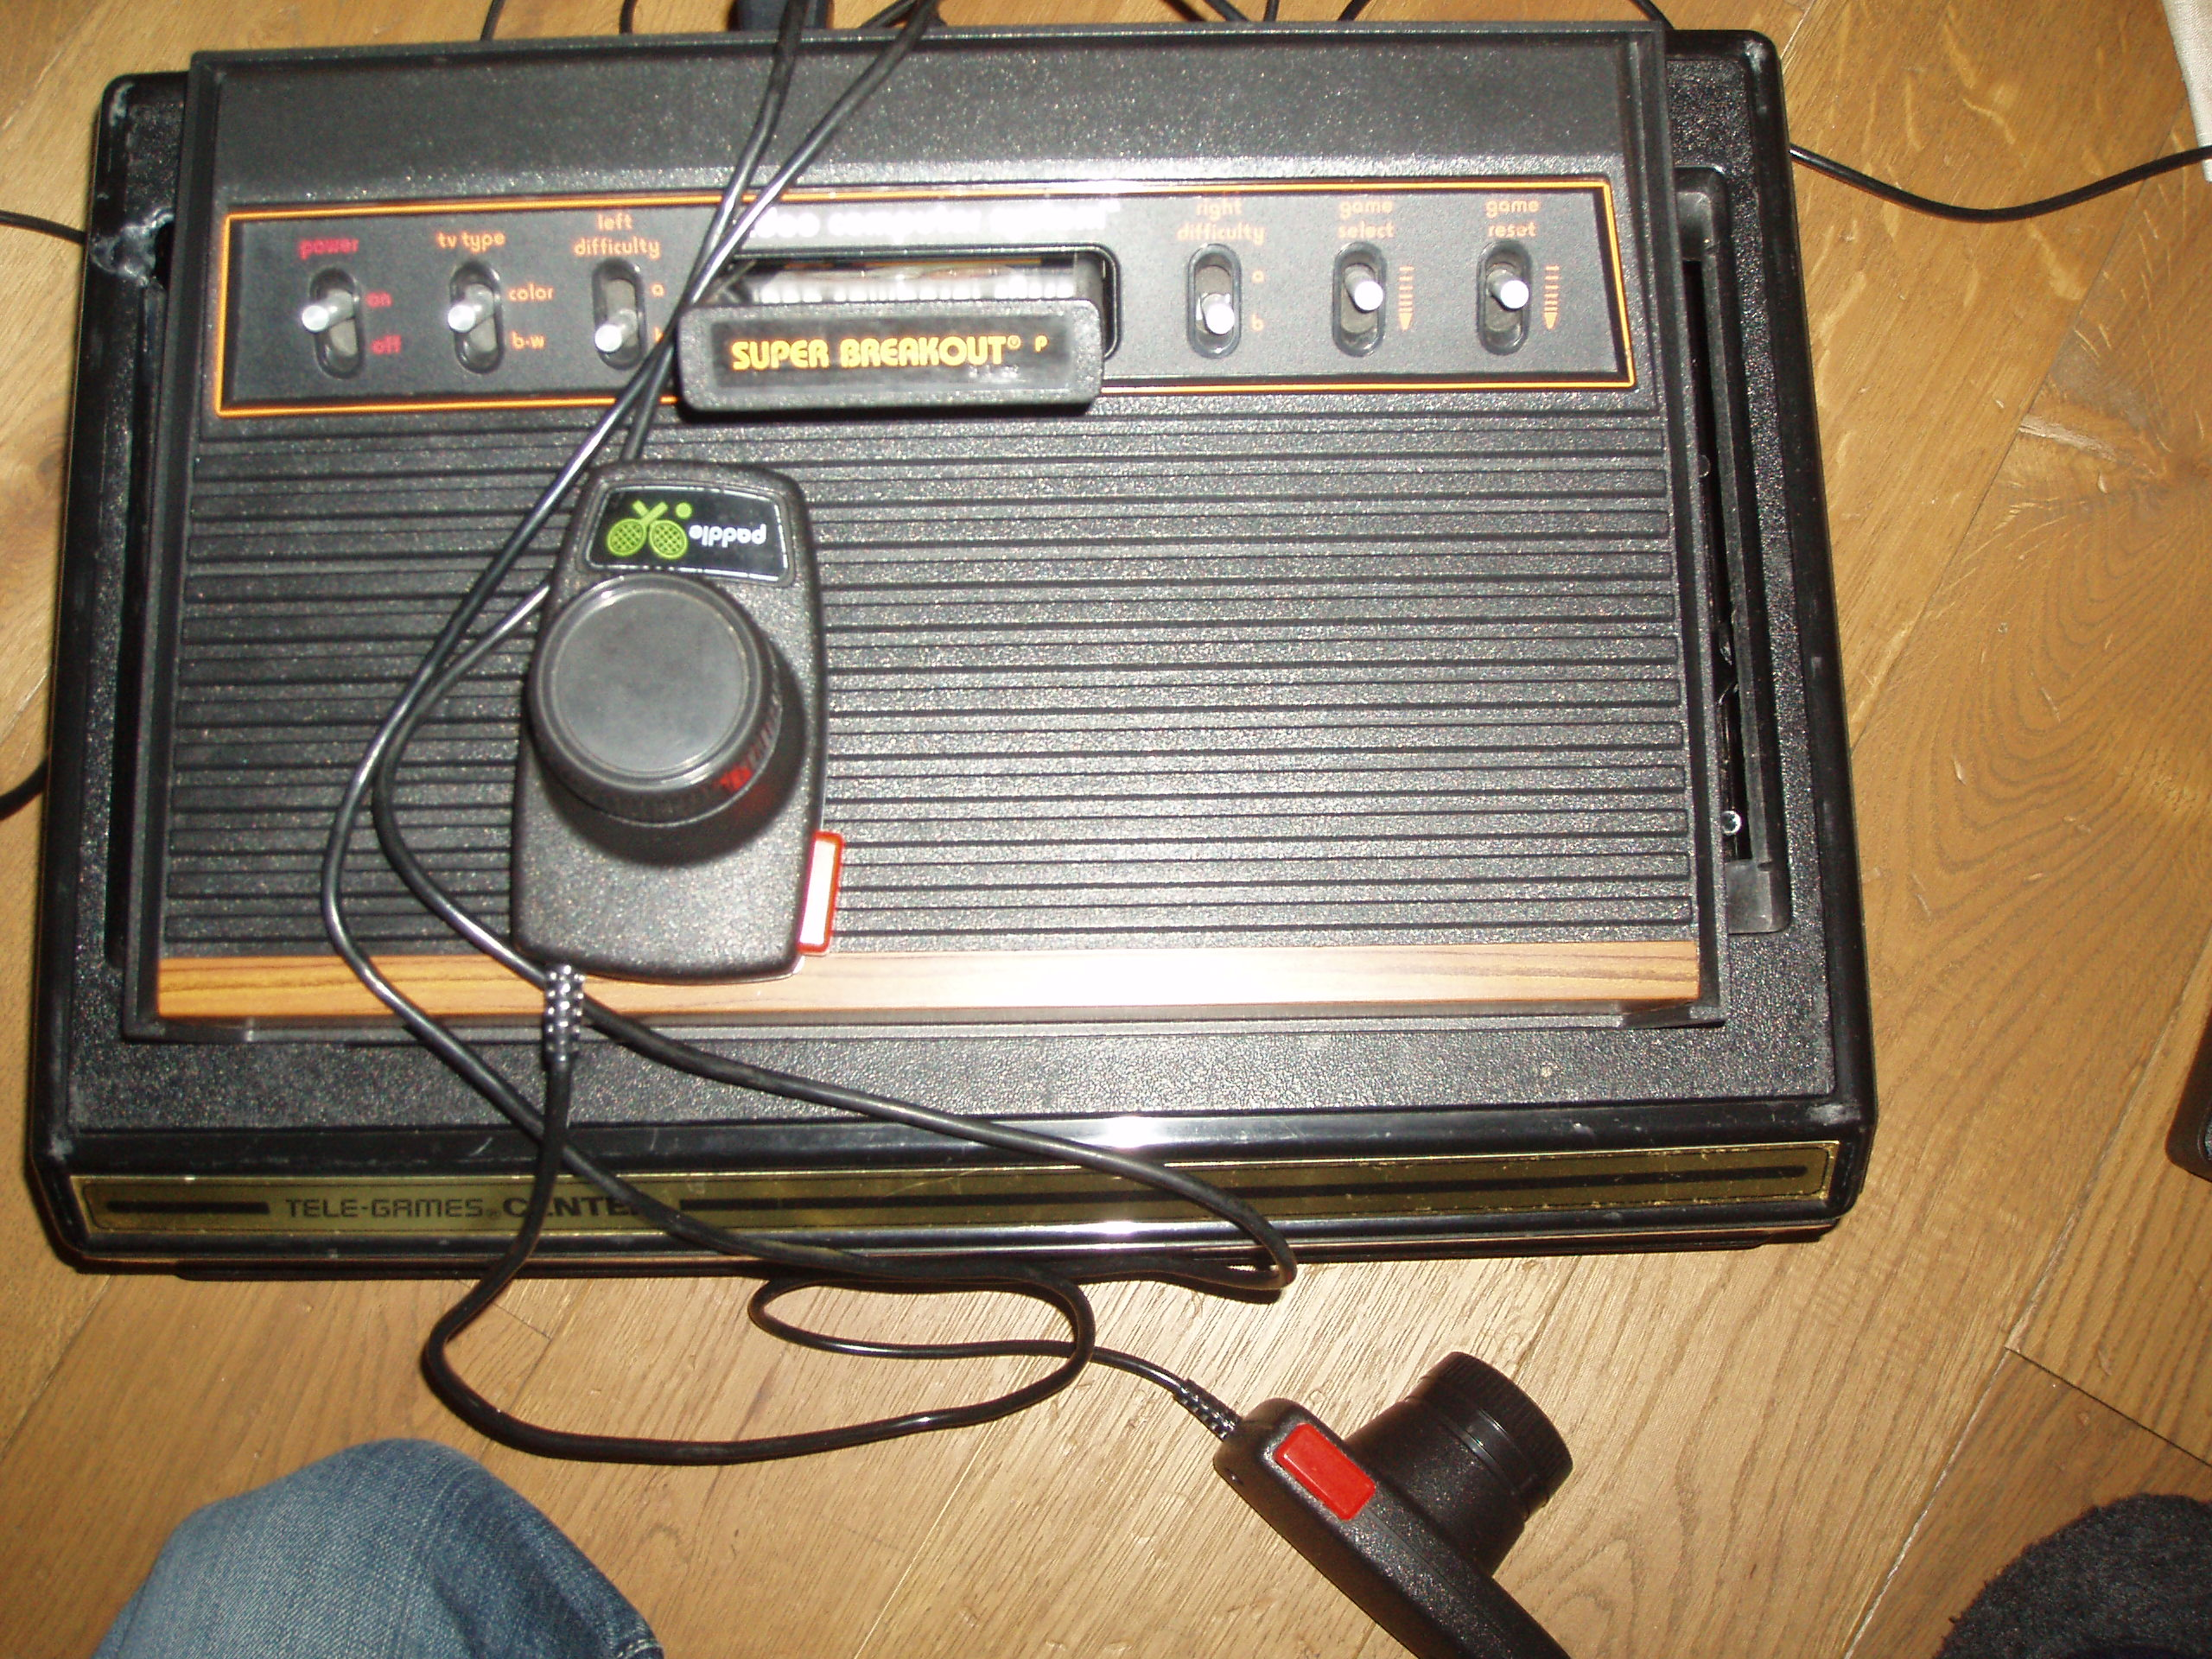 atari2600forever: Super Breakout (Atari 2600 Novice/B) 402 points on 2018-04-18 03:55:35